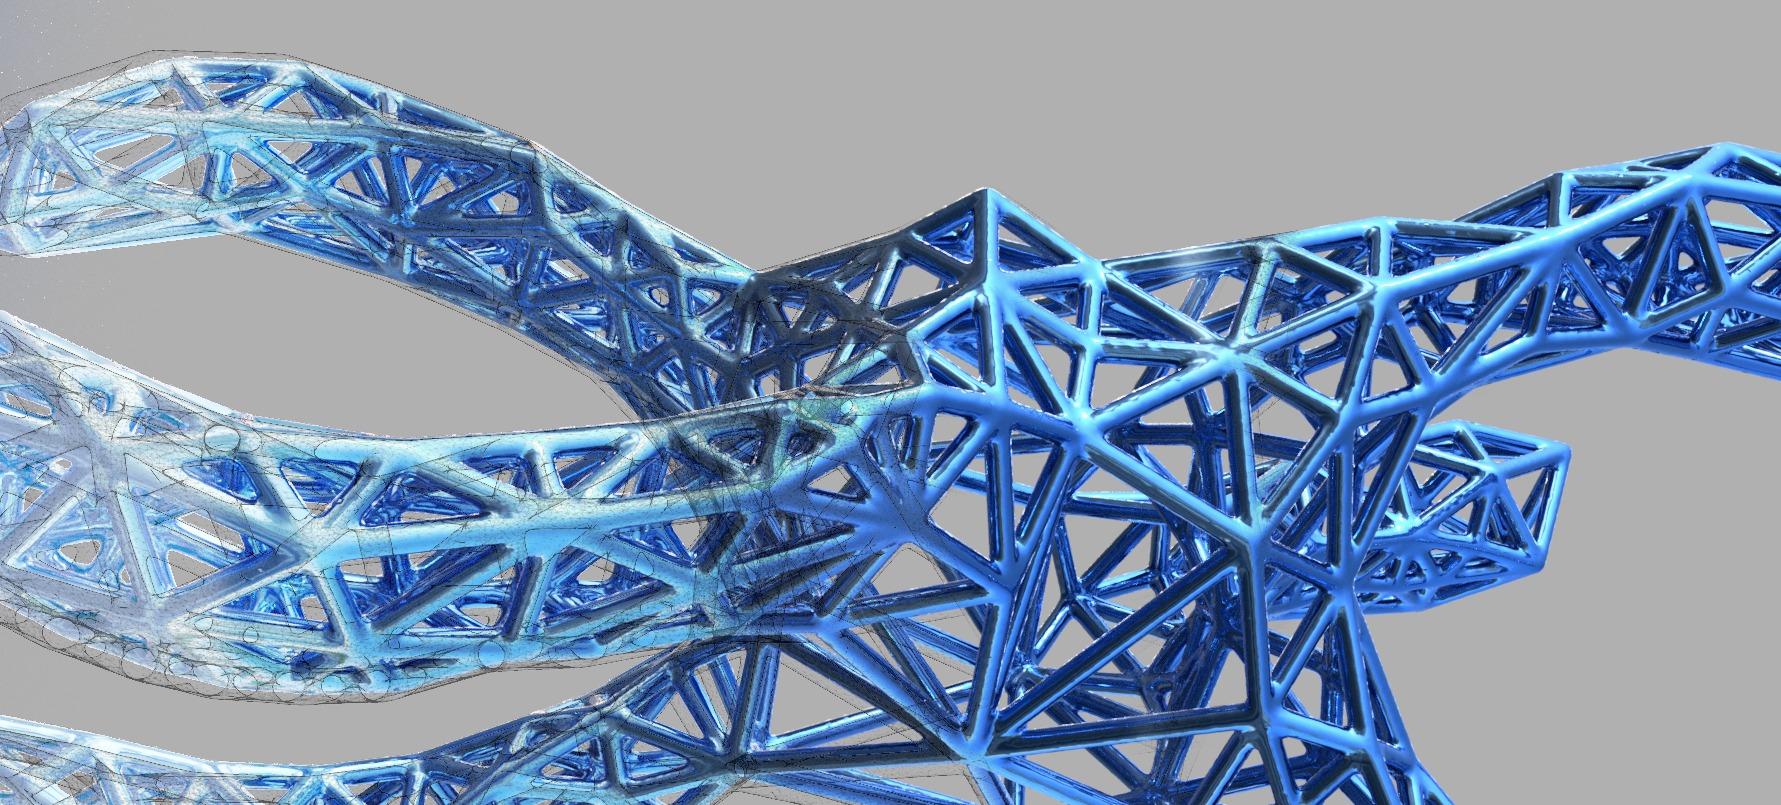 Lattice Structure|Autodesk Online Gallery